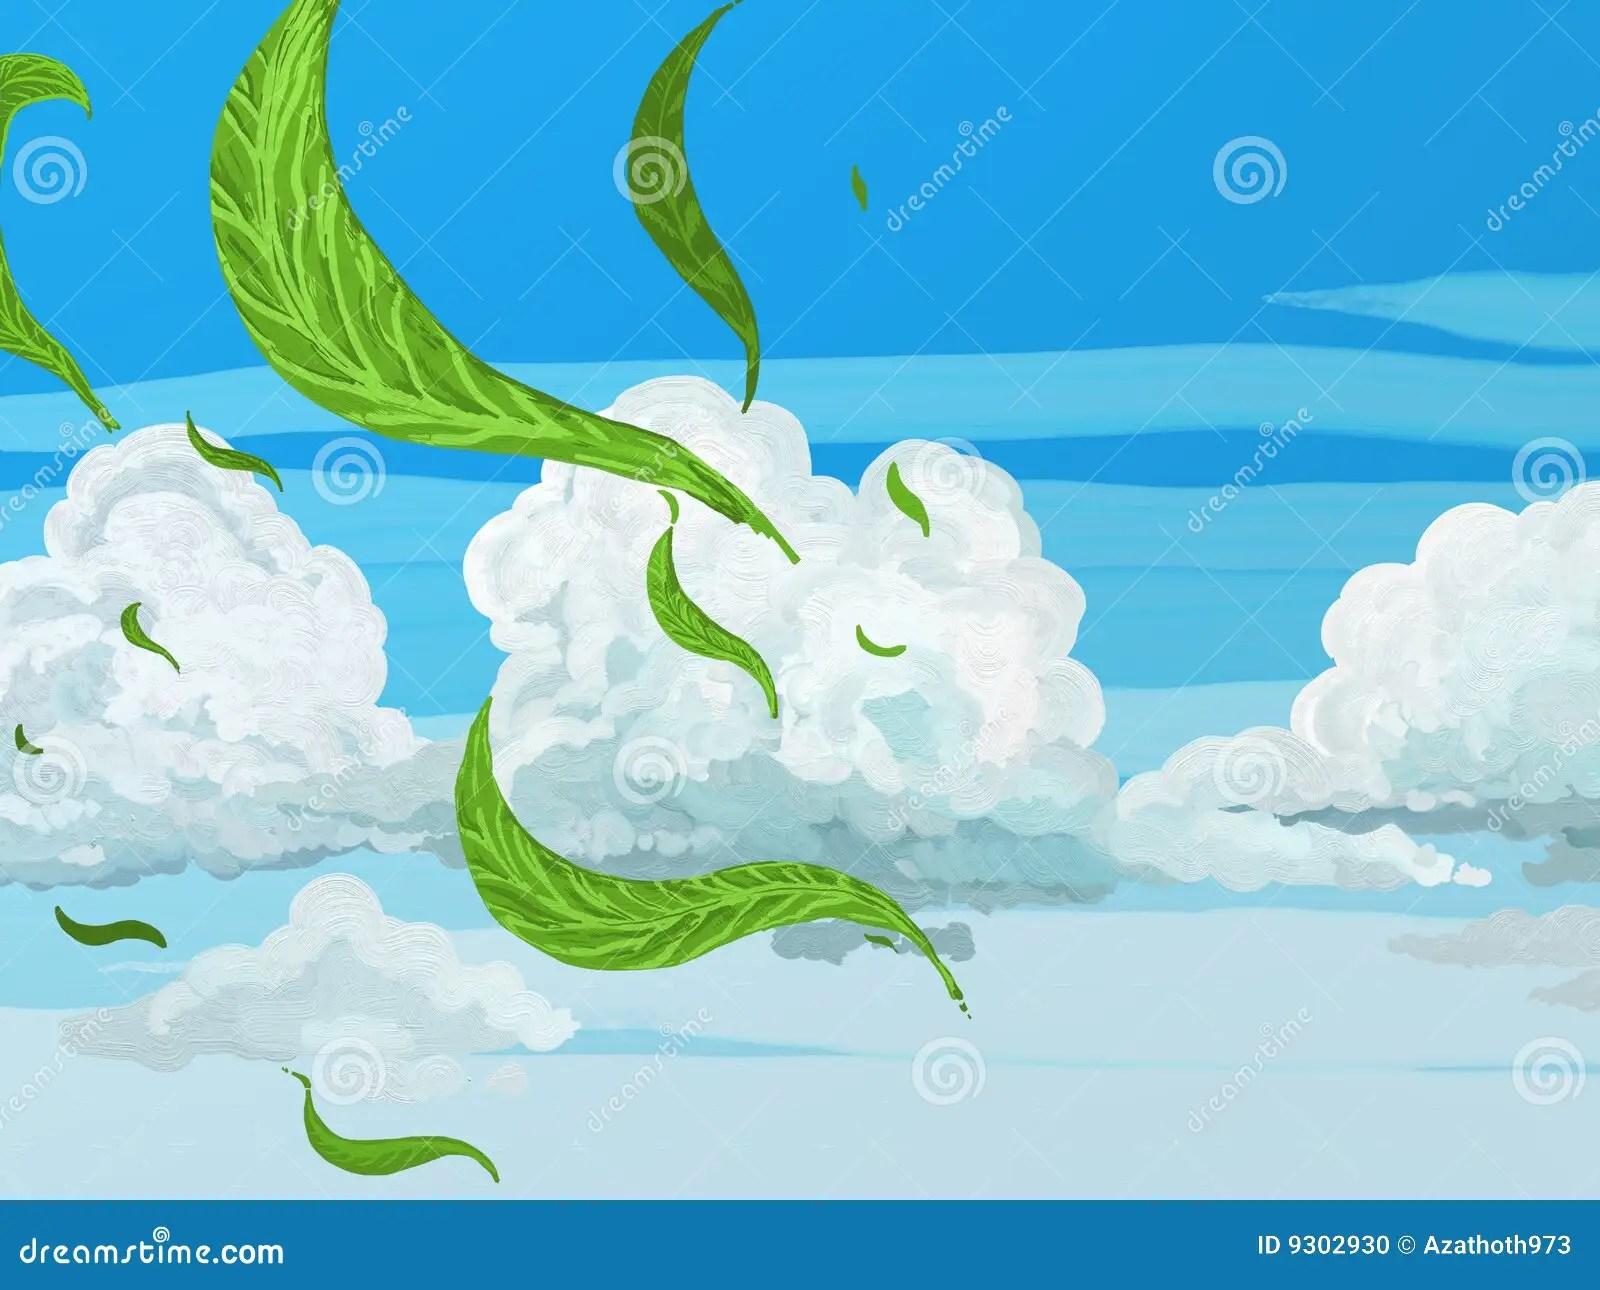 Breeze Cartoons Illustrations Amp Vector Stock Images